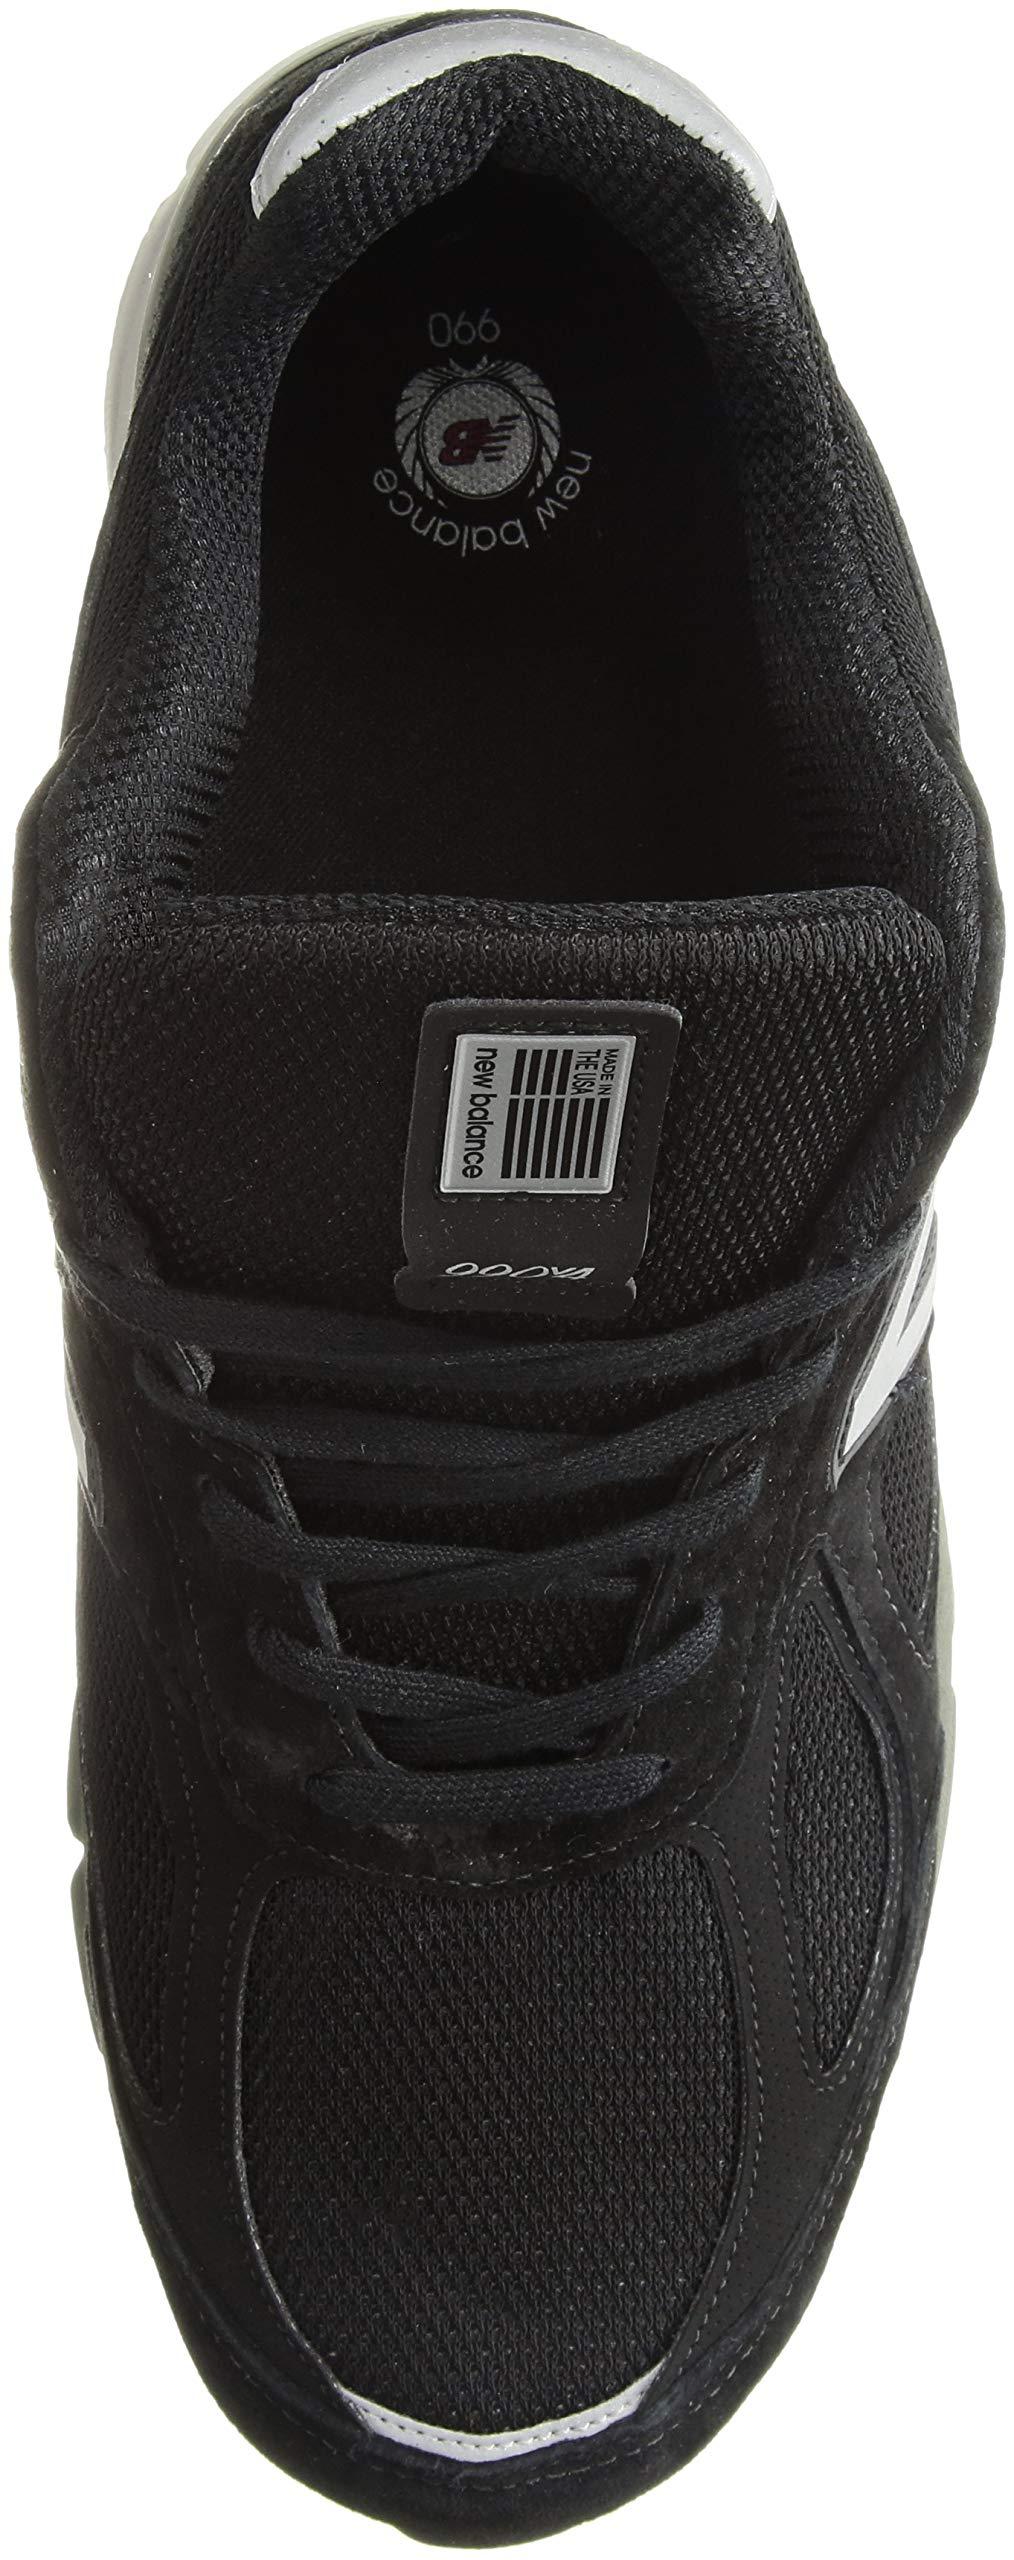 81SM6zY8OJL - New Balance Mens M990 990v4 Black Size: 7.5 Wide